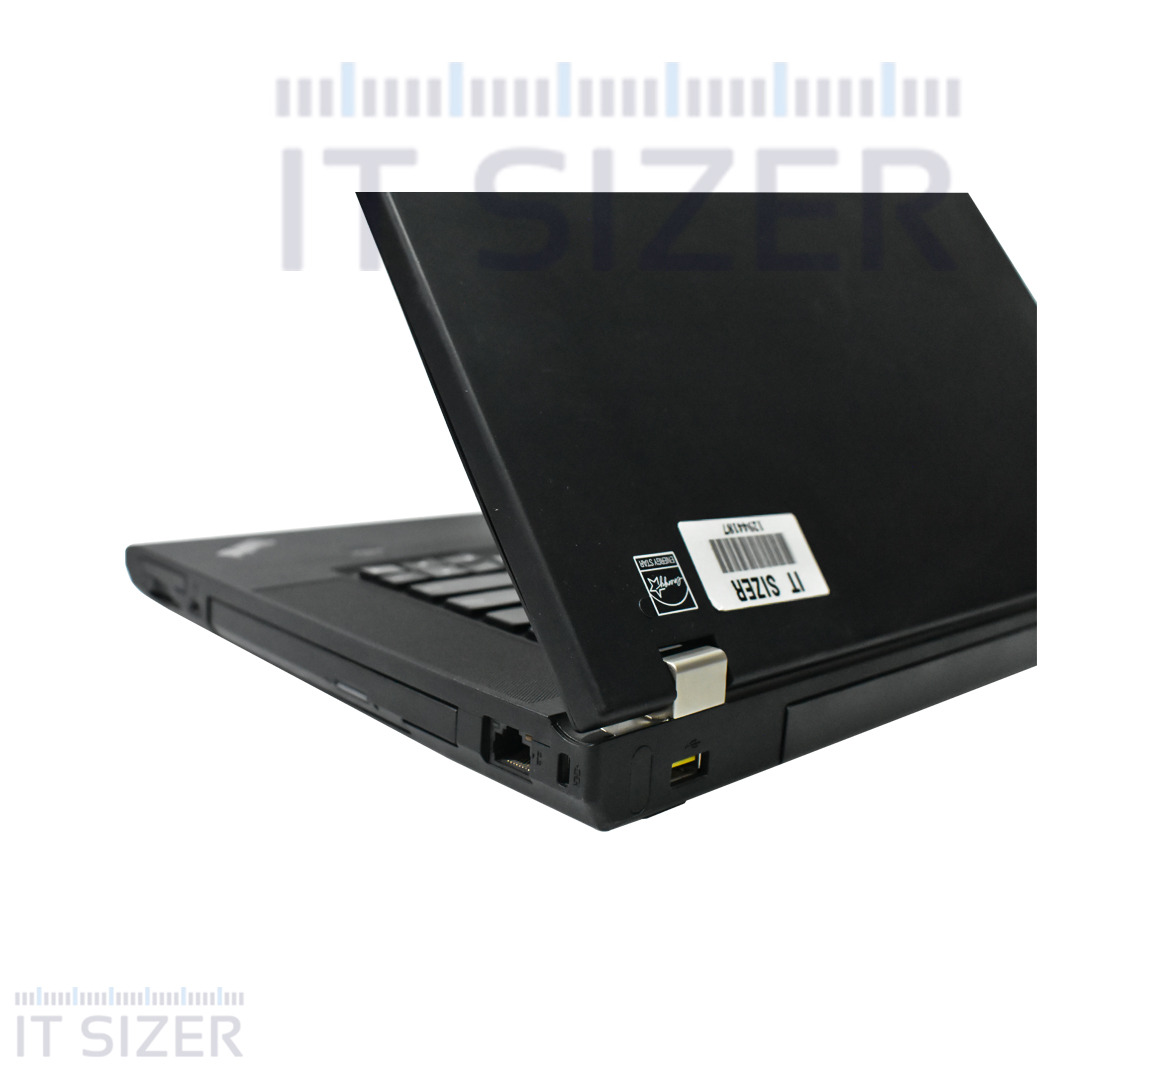 Lenovo W530 Business Laptop, Intel Core i7 CPU, 8GB DDR3 SODIMM RAM, 256GB SSD 2.5, 15 inch Display, Windows 10 pro (Renewed)